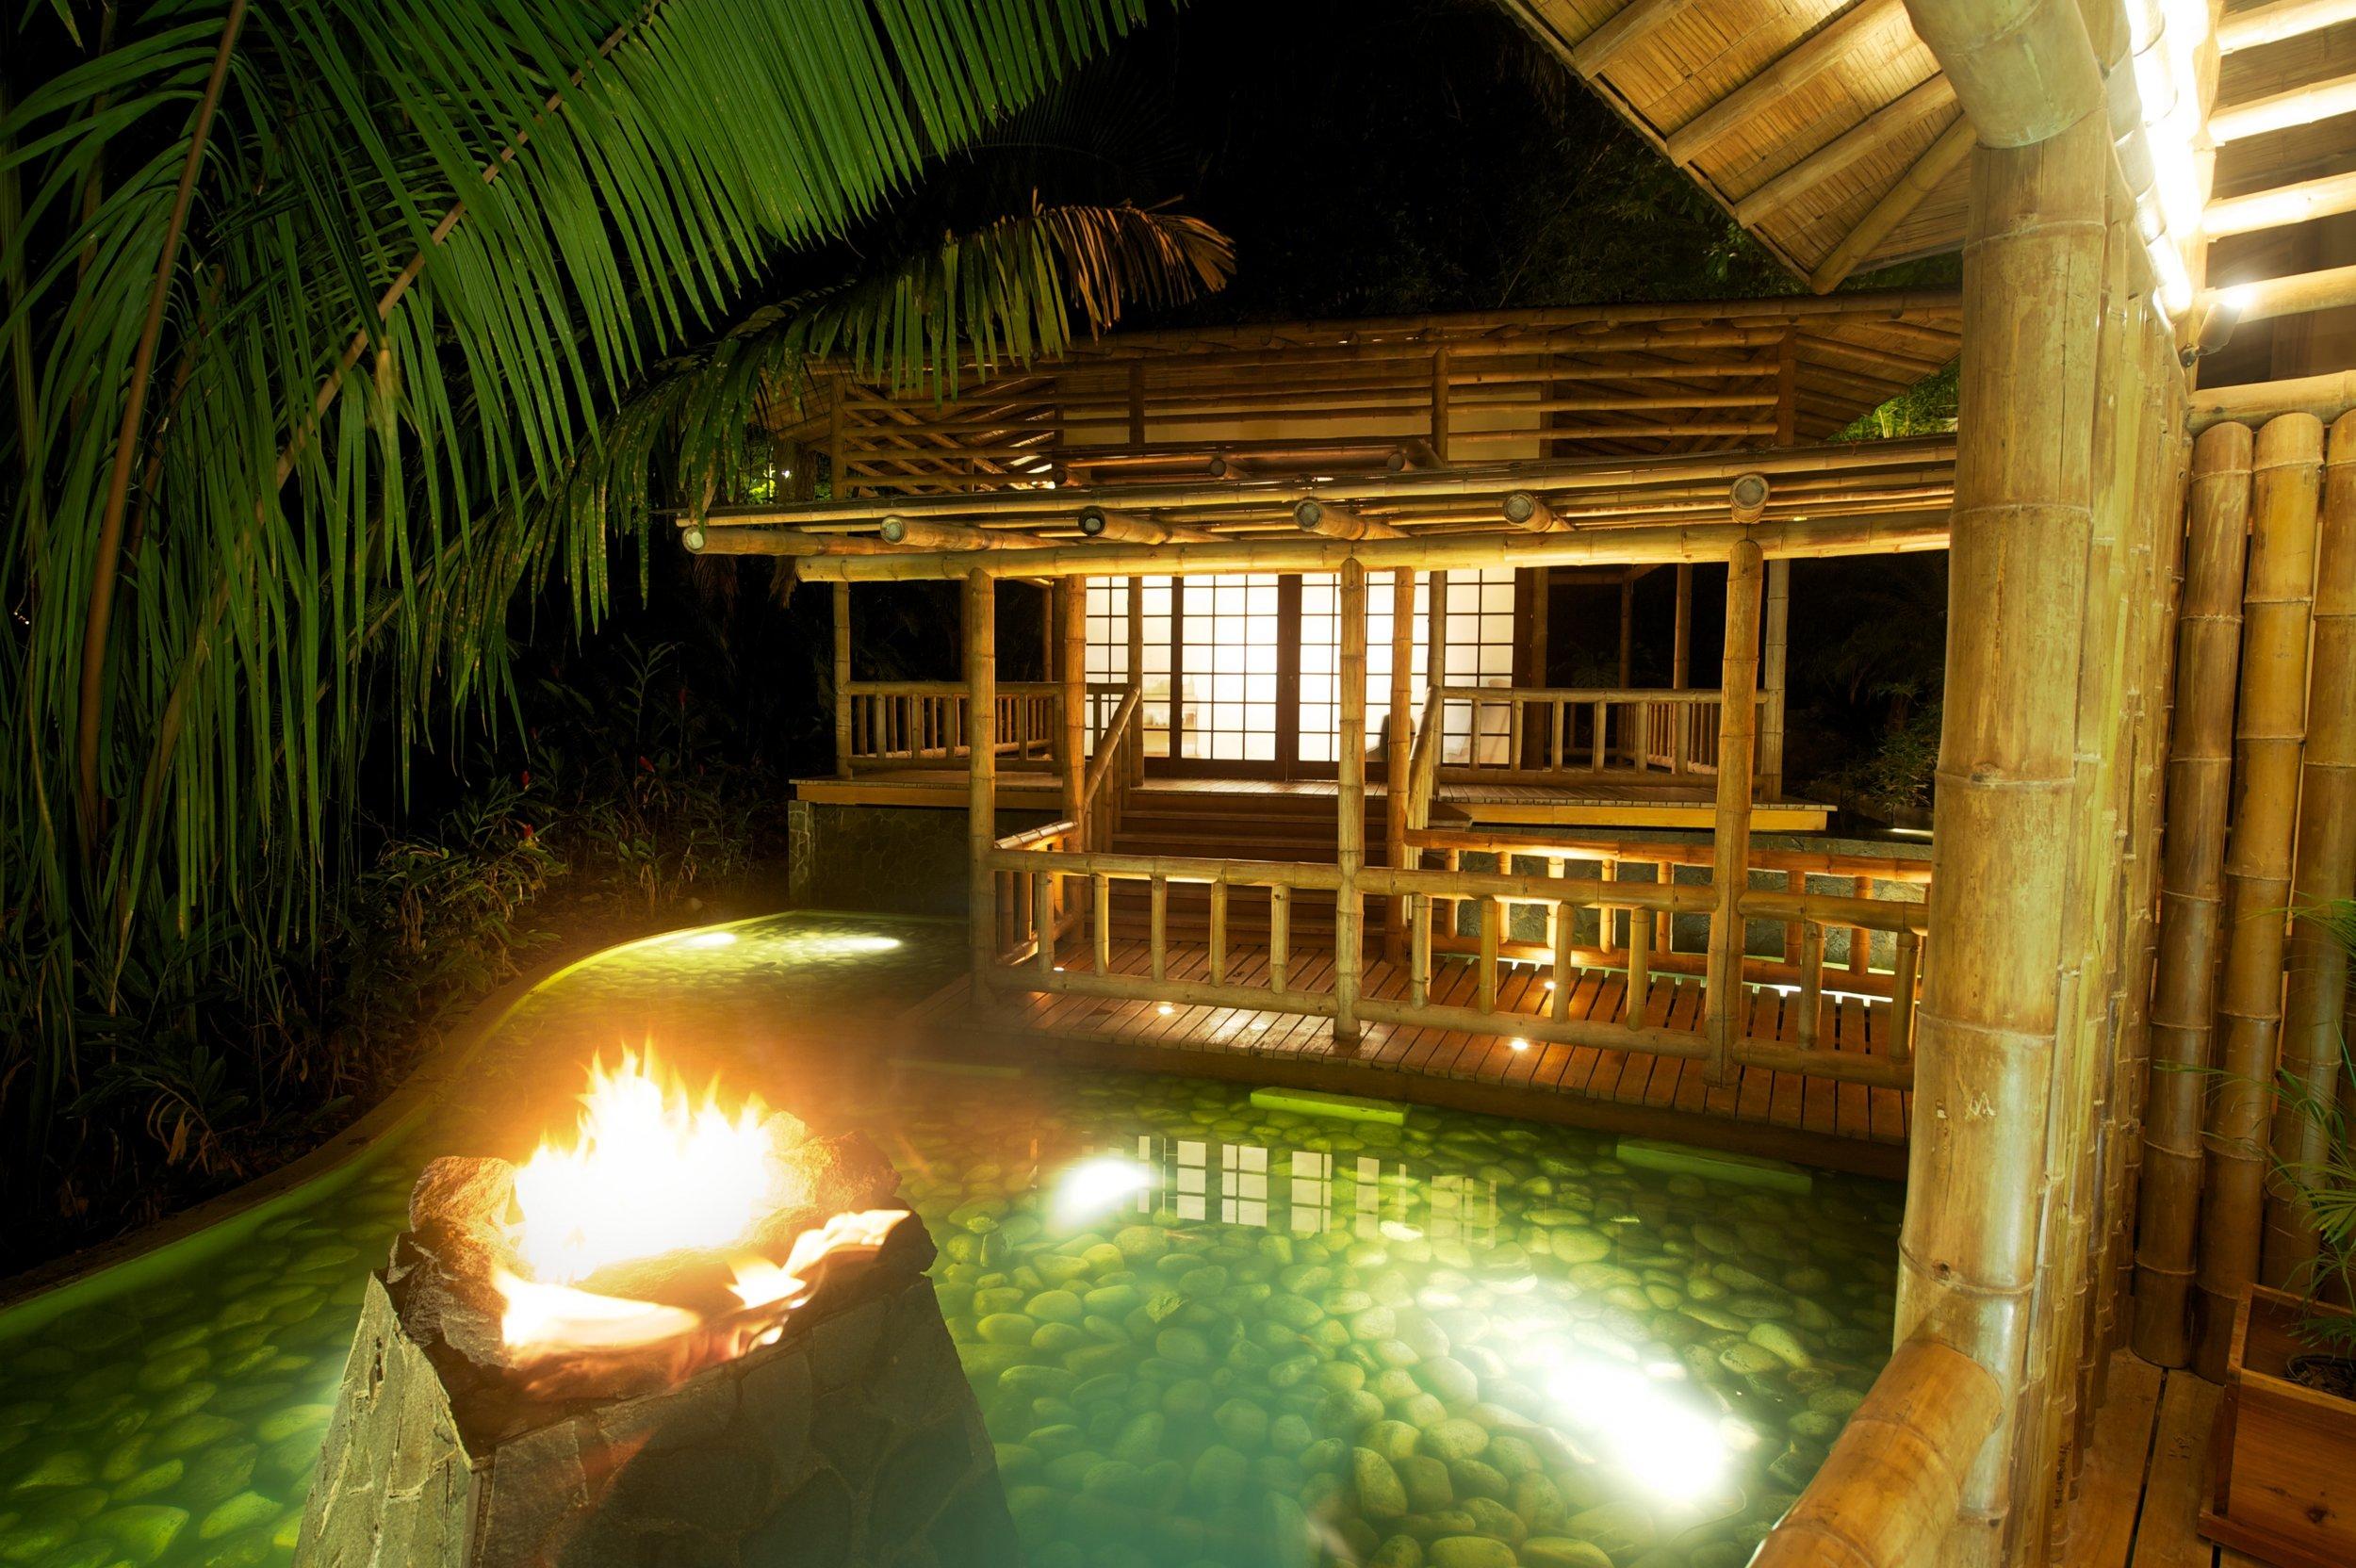 spa-bambu-architecture-florblanca-costa-rica (1).jpg